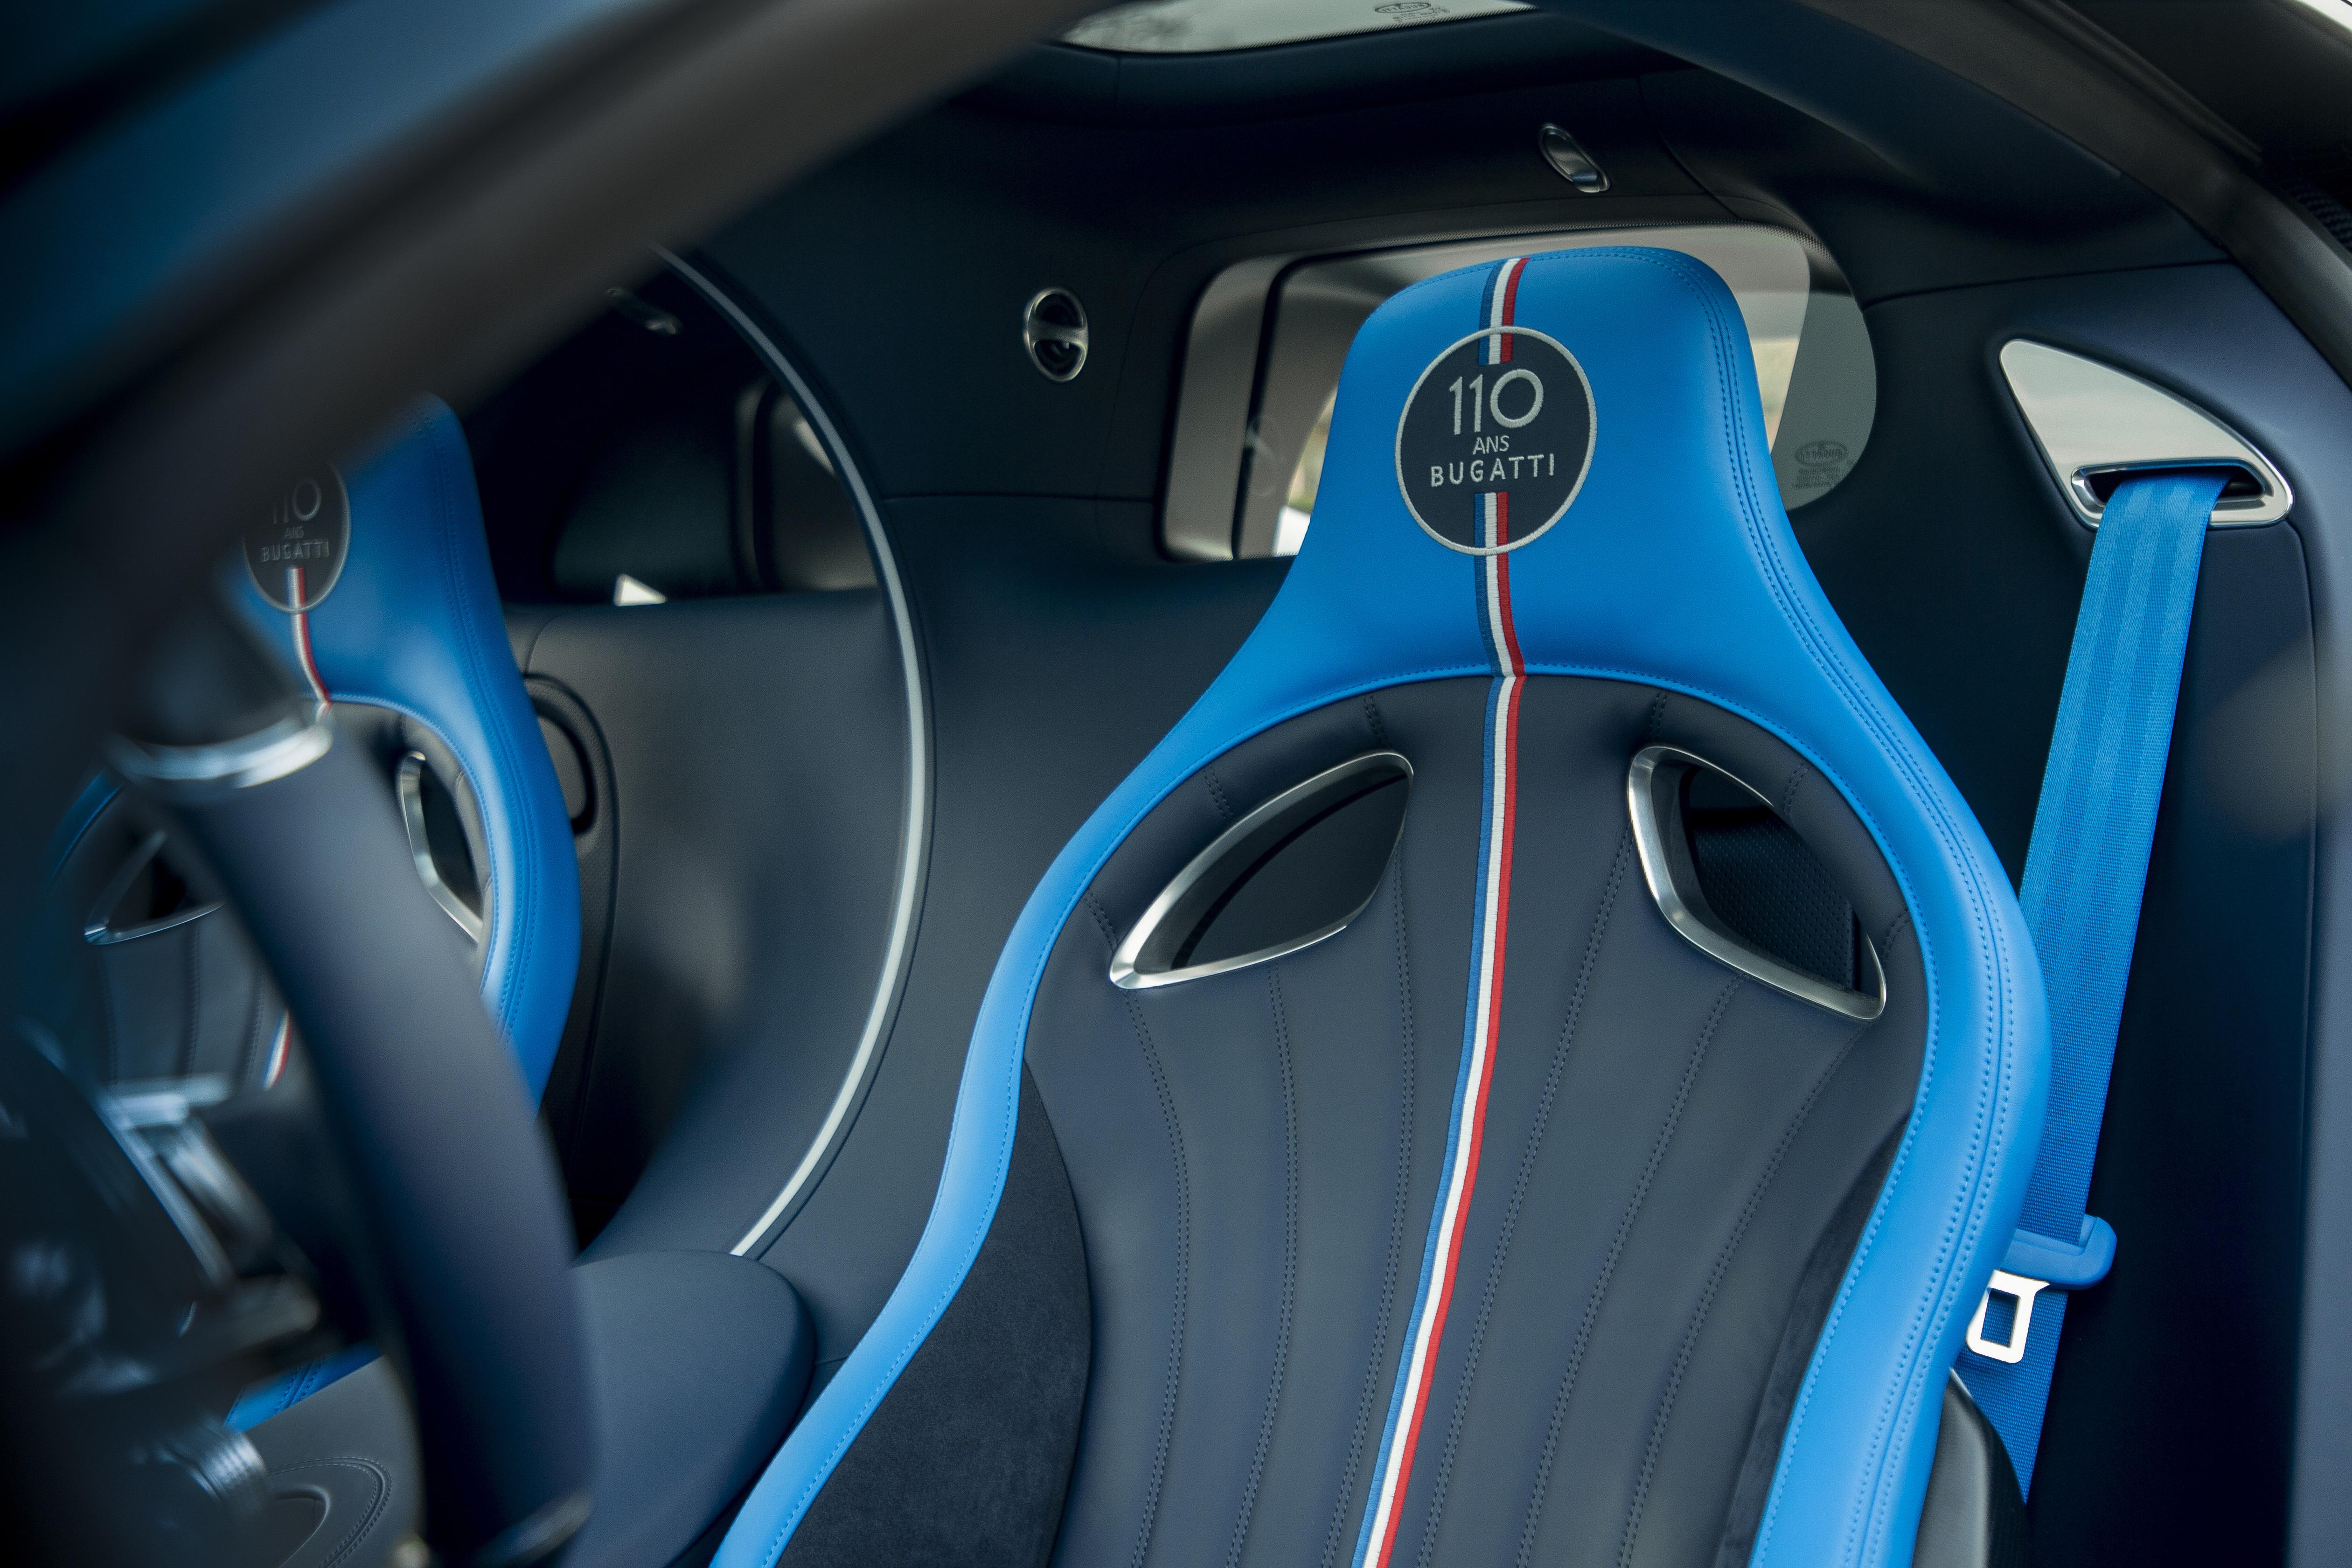 bugatti-chiron-sport-110-ans-bugatti-8.jpg